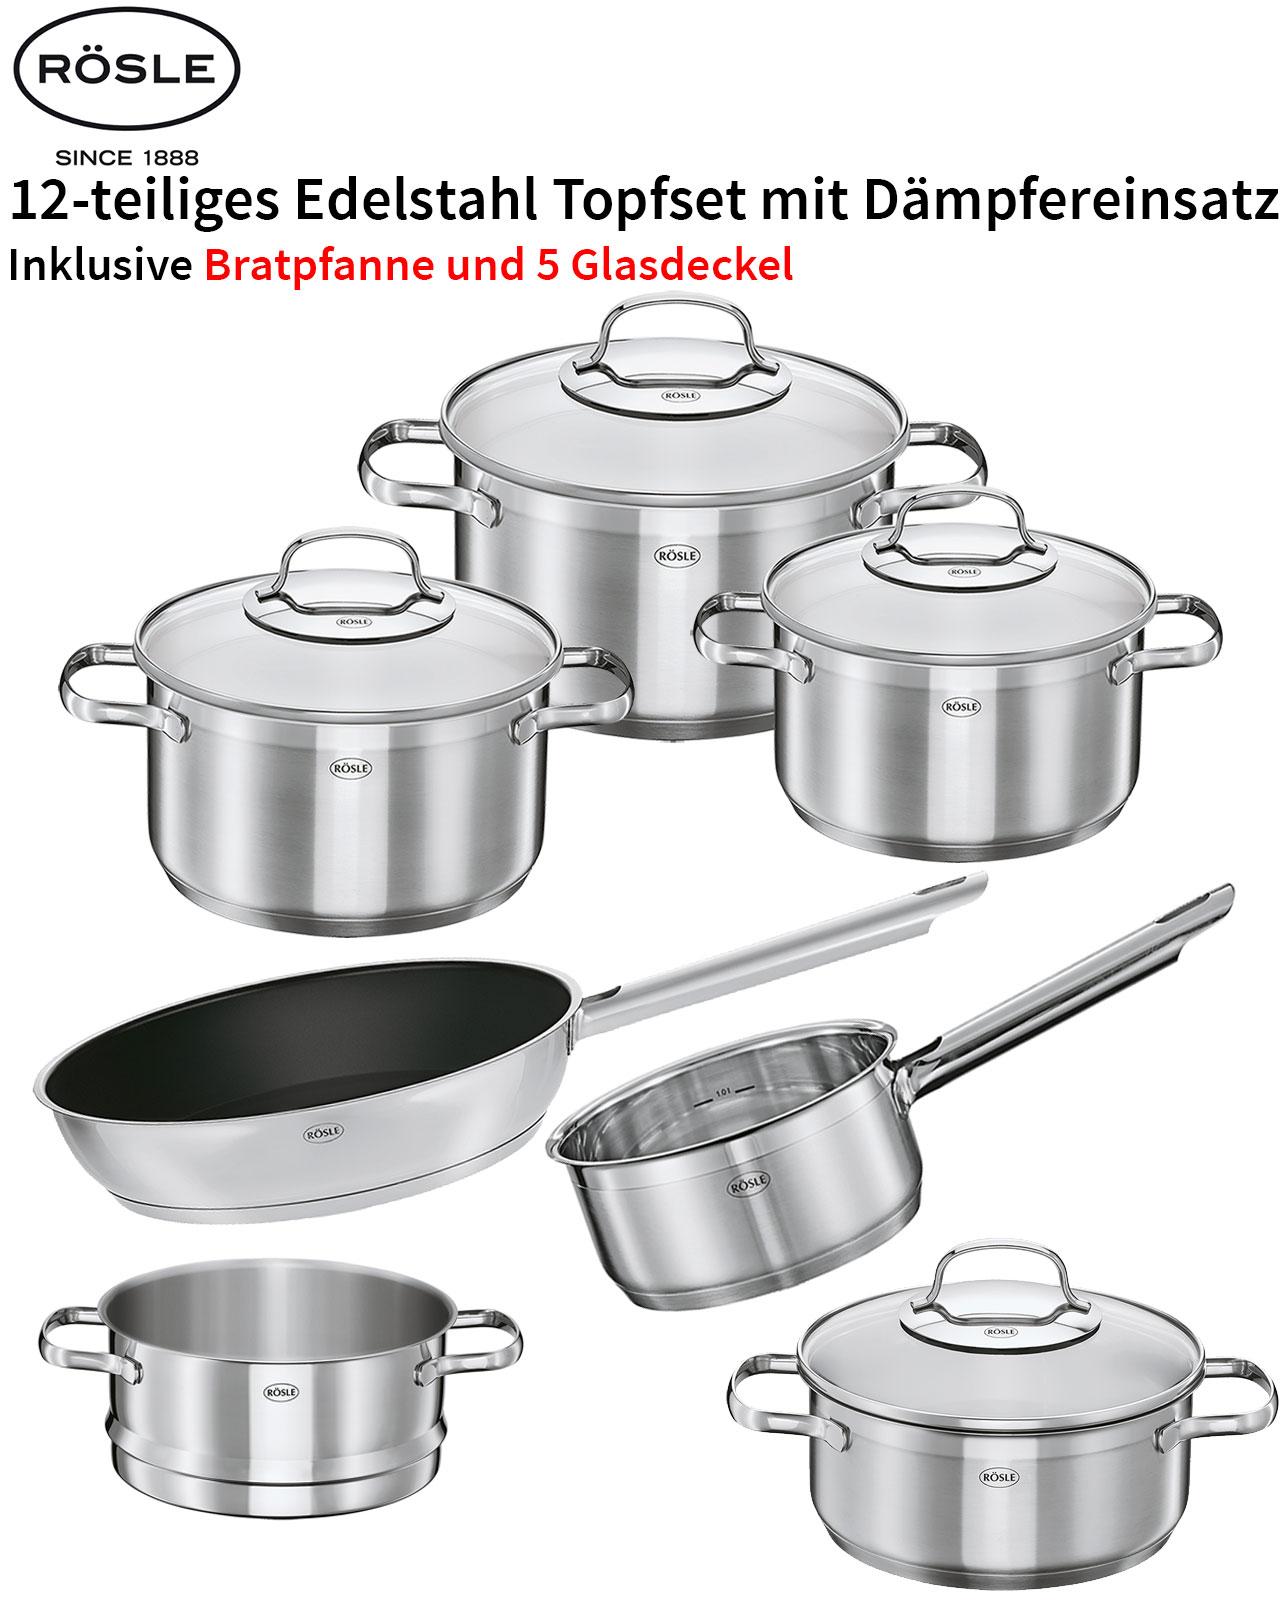 Rösle Edelstahl Induktion Topfset Pfanne Elegance 12tlg PFOA frei Dämpfeinsatz